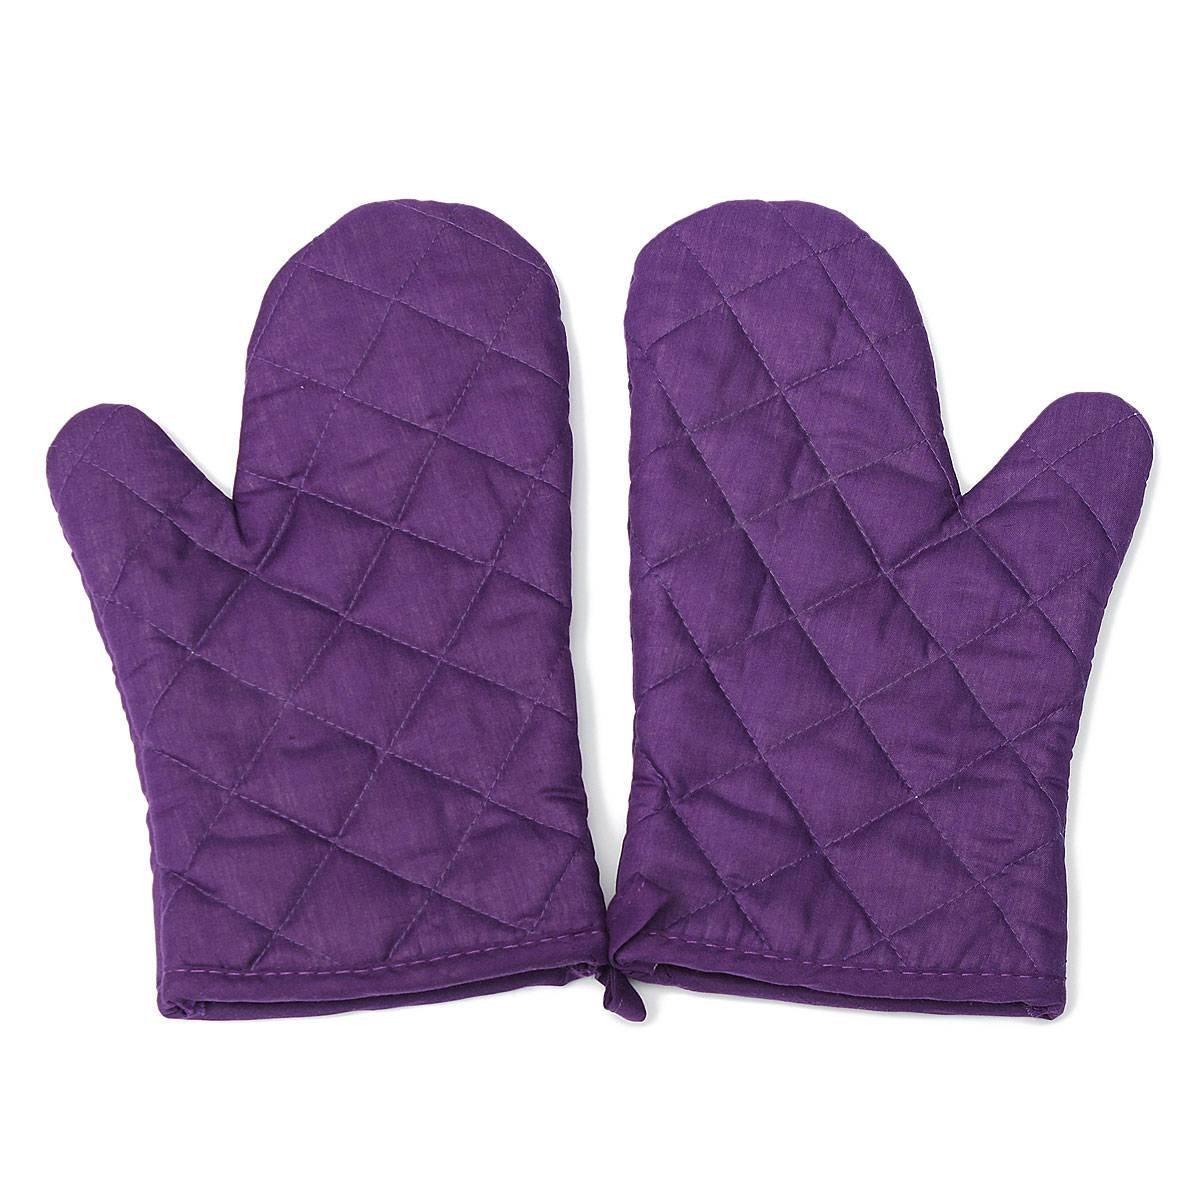 1 pair kitchen craft heat resistant cotton oven glove pot holder baking cooking mitts purple christmas decoration